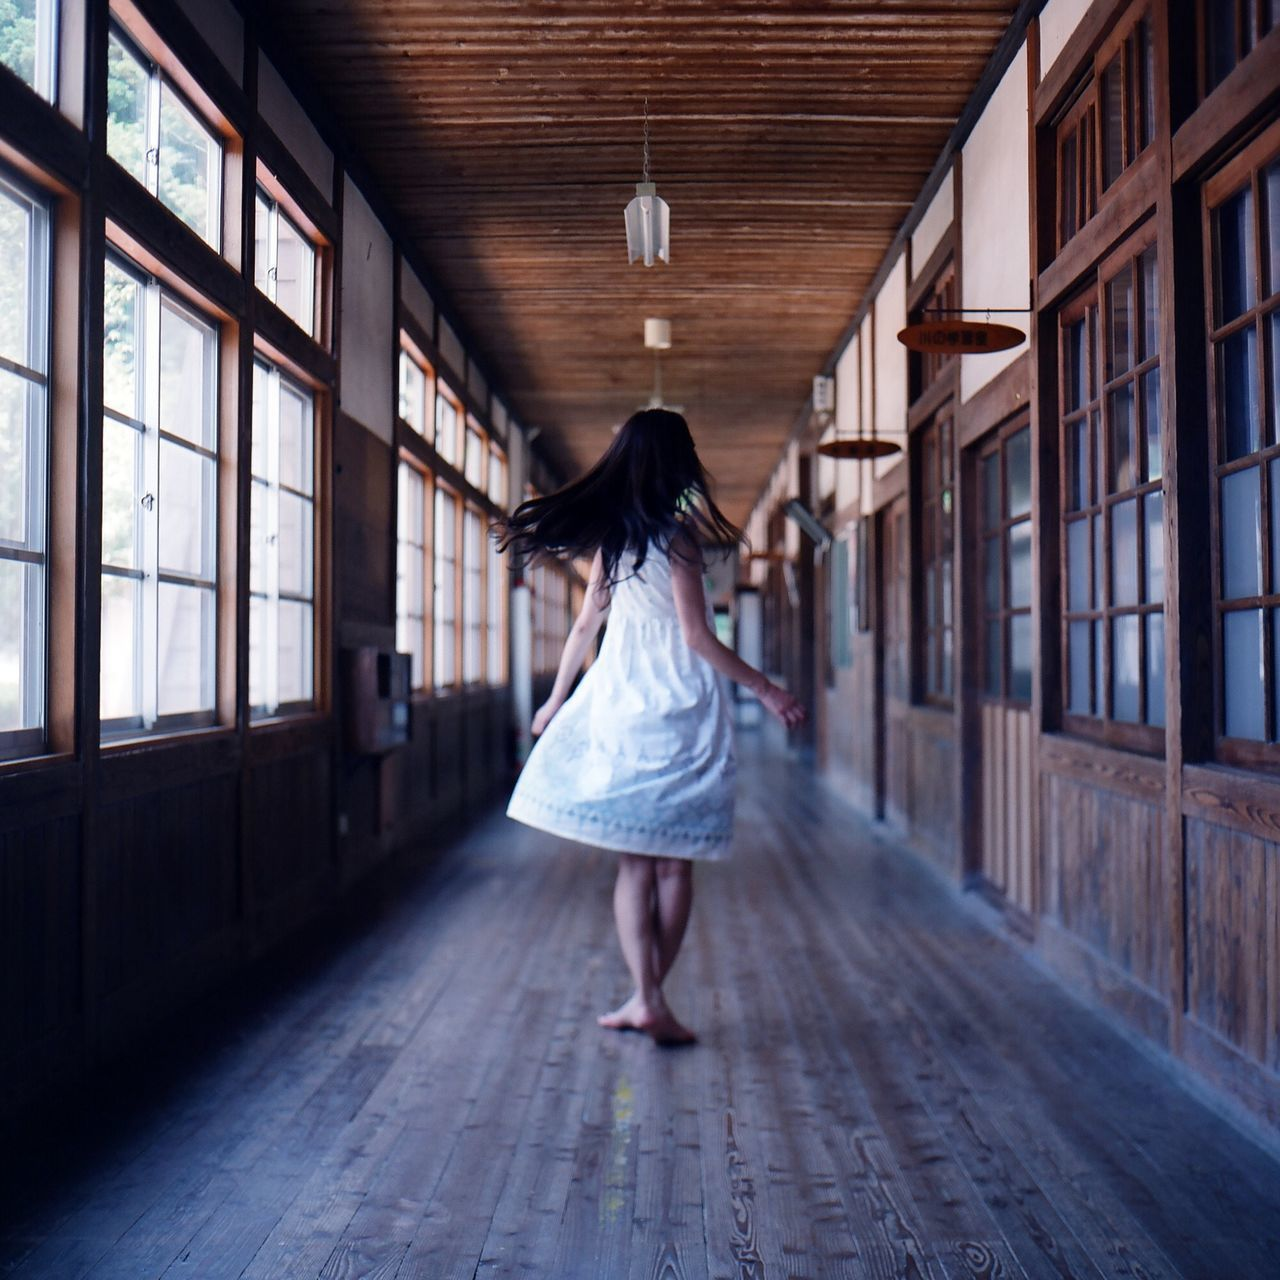 Woman Spinning In Corridor